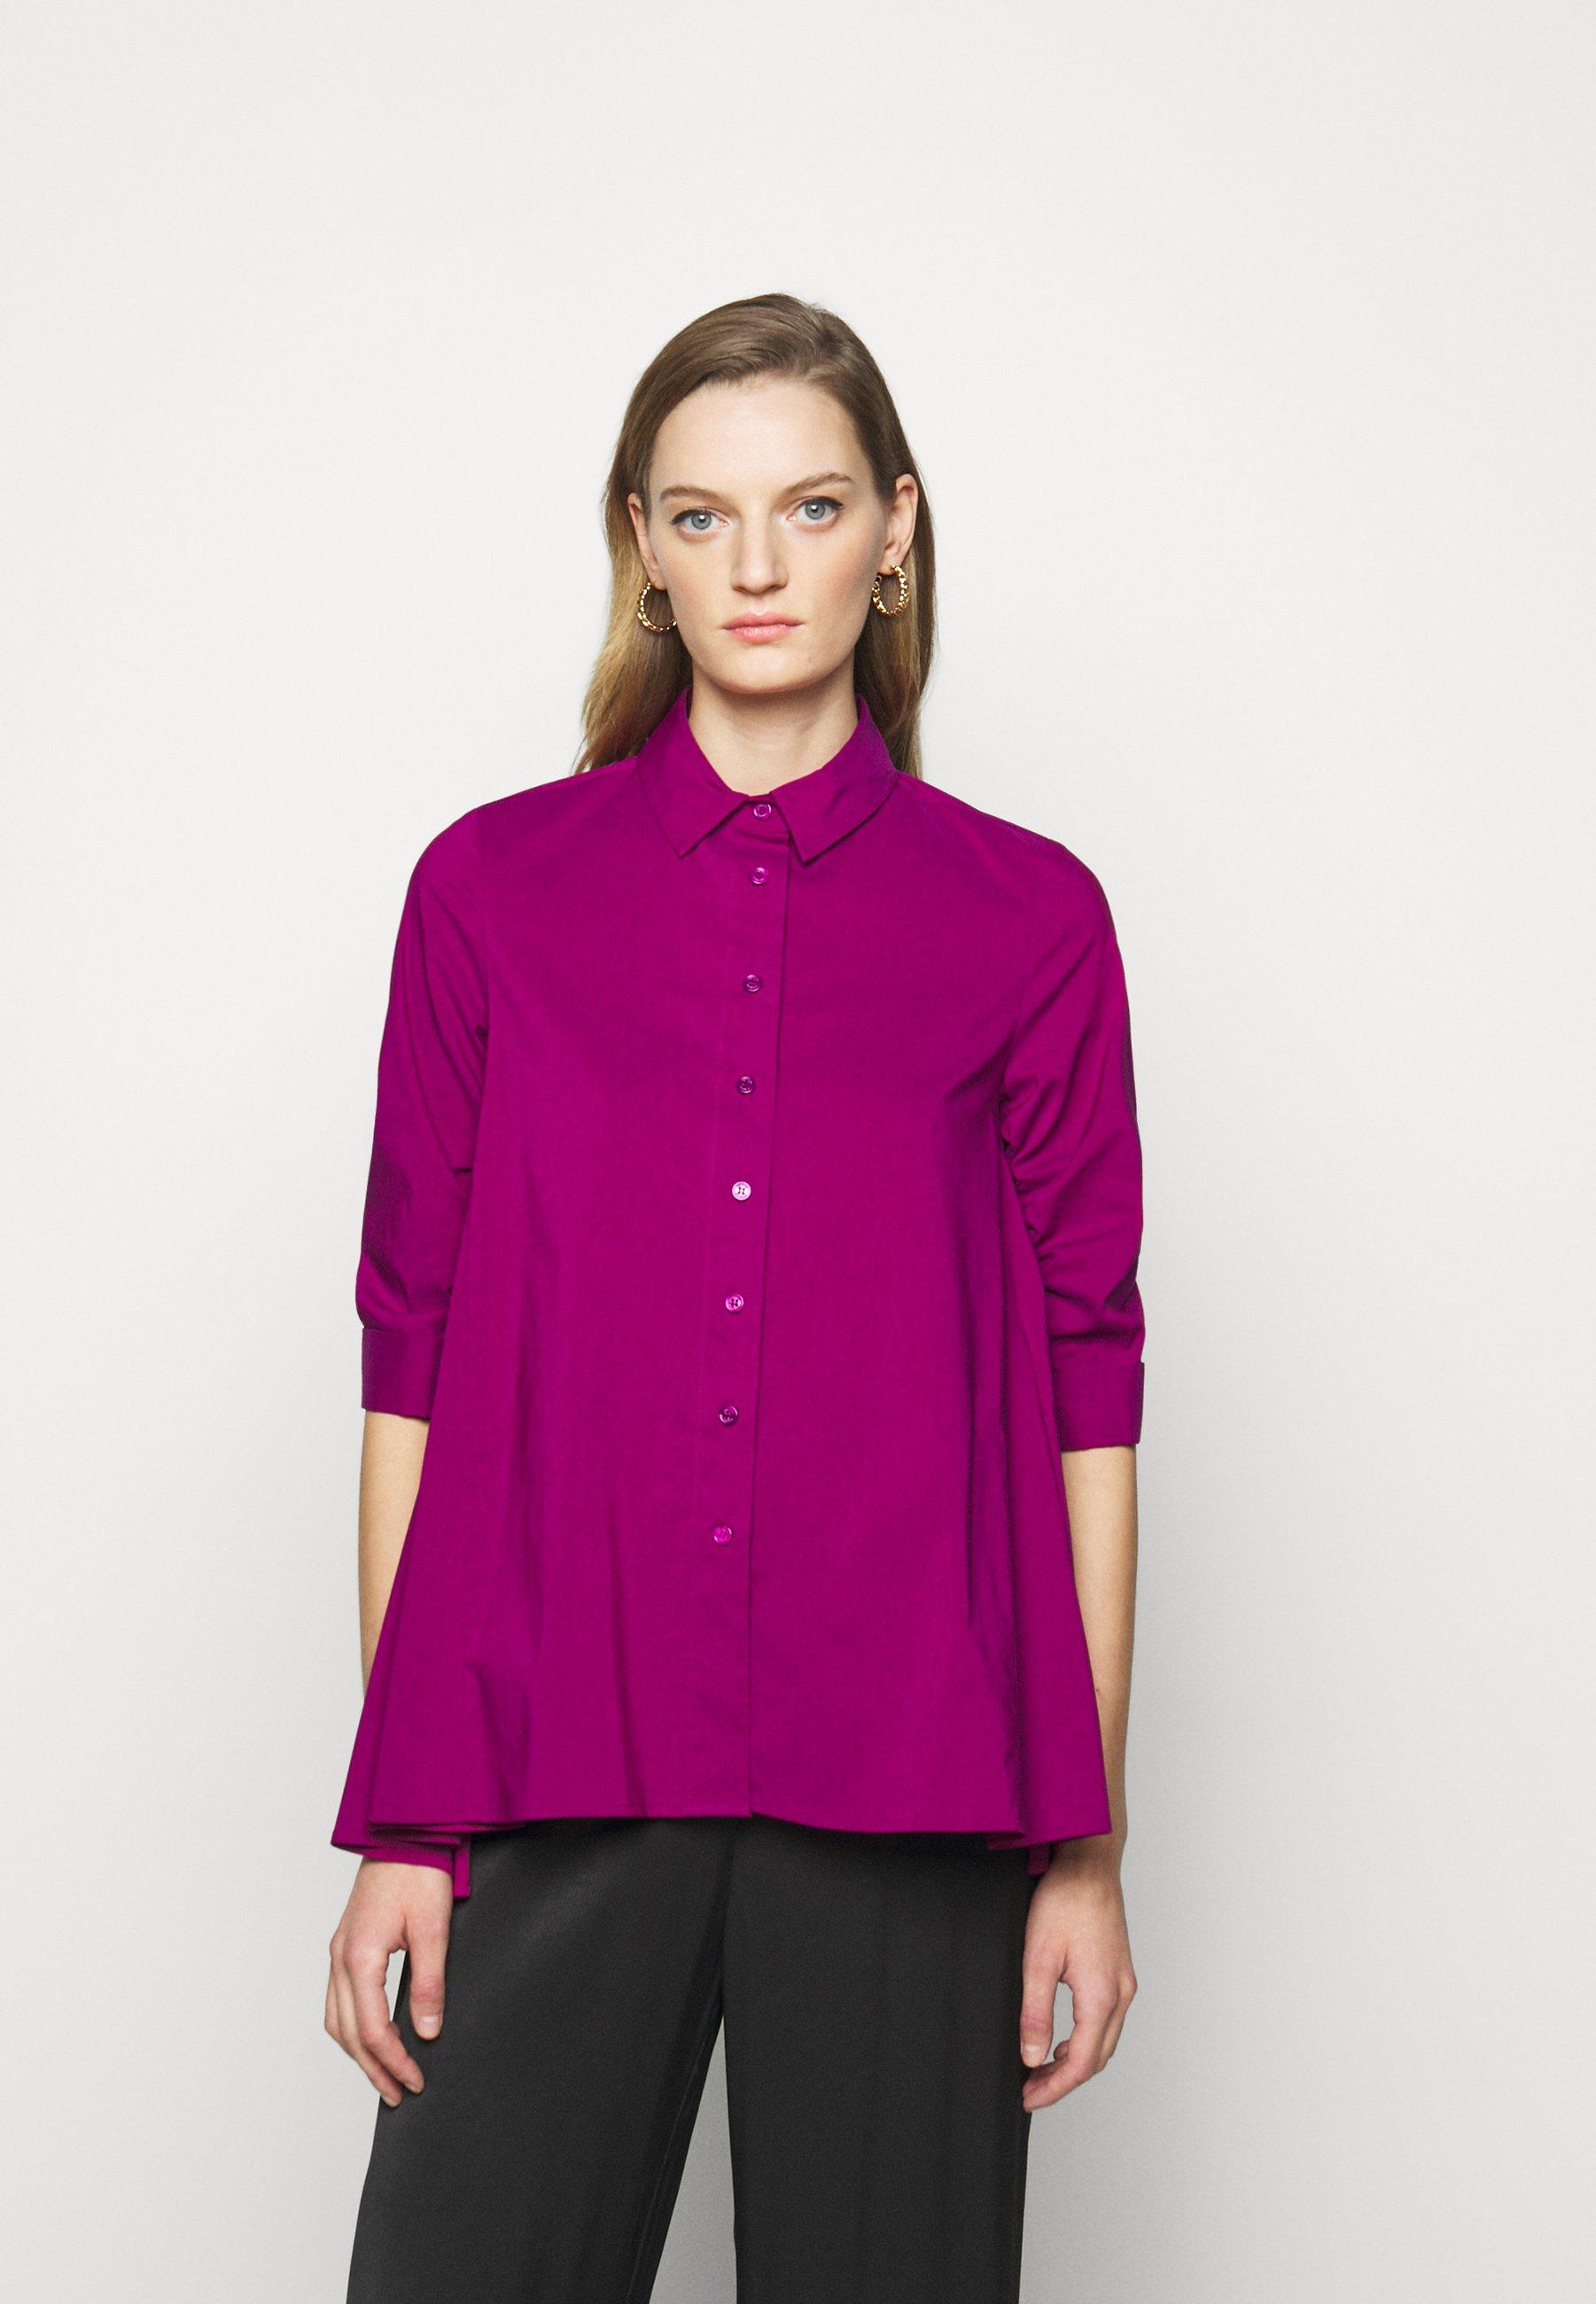 Donna BENITA FASHIONABLE BLOUSE - Camicia